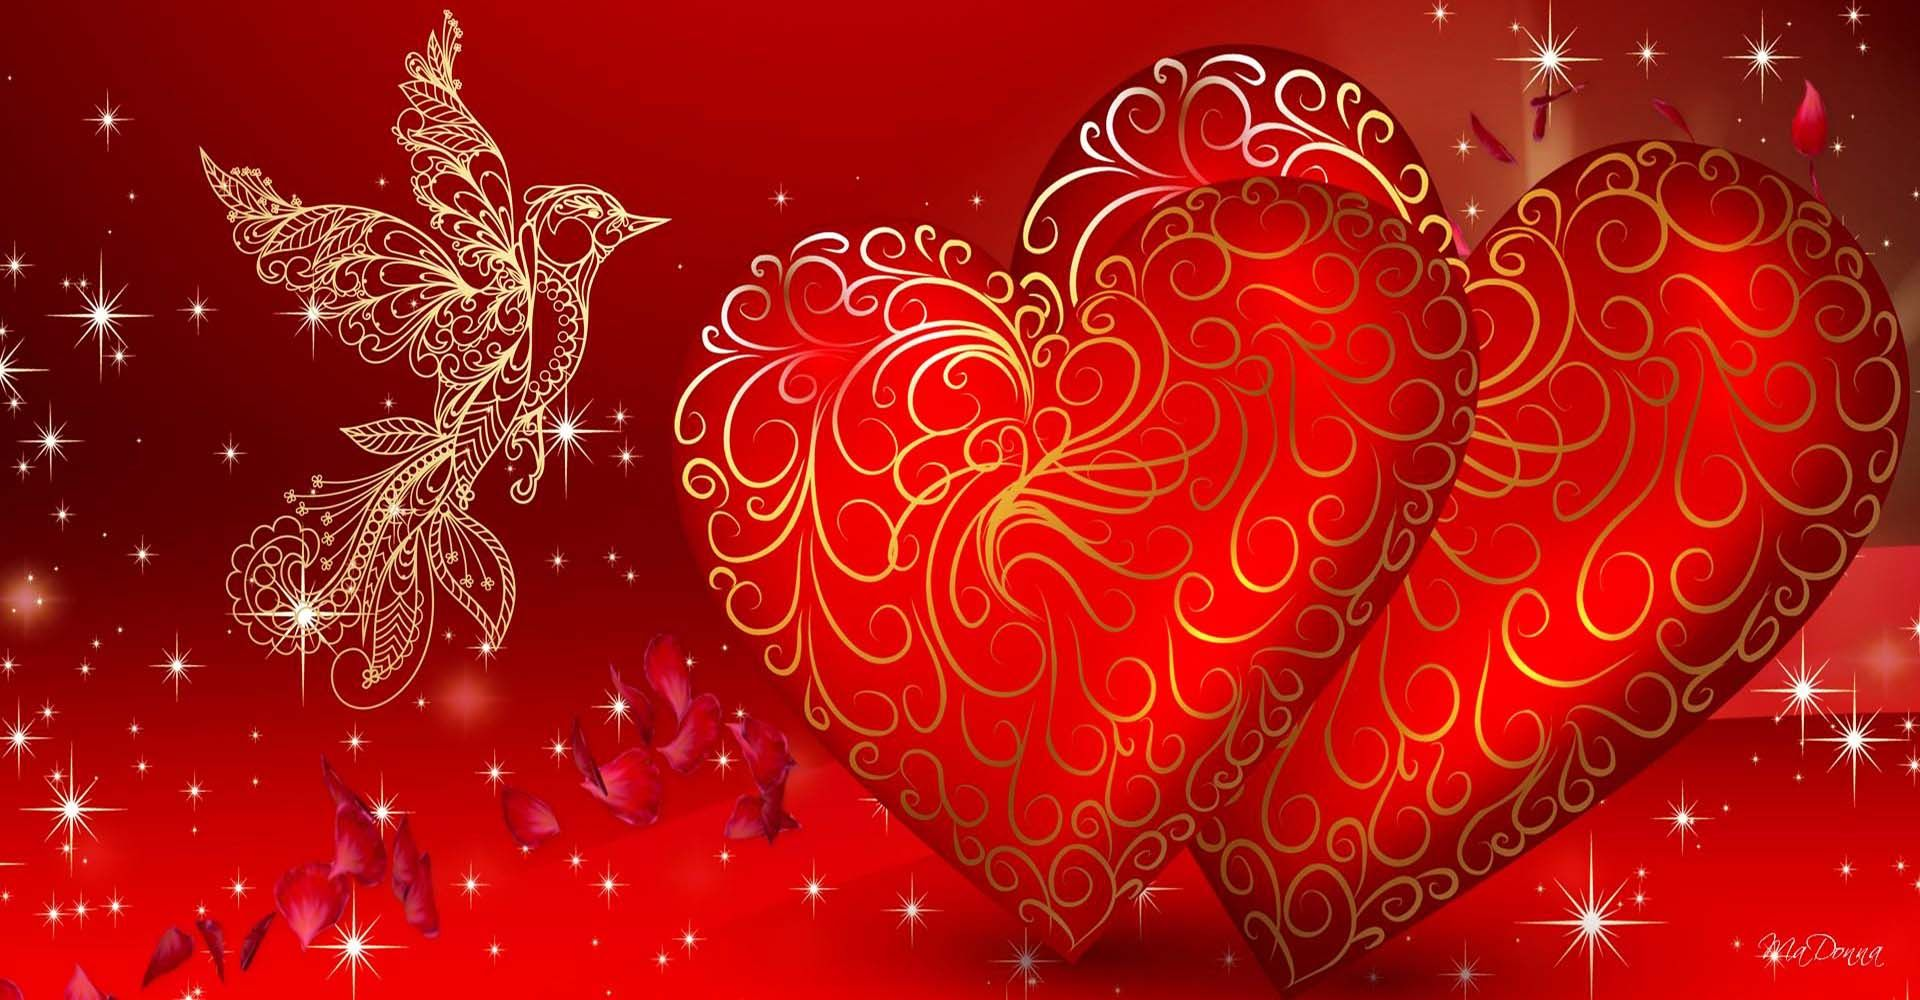 Hearts Wallpaper Images #eUn | Awesomeness | Love heart ...